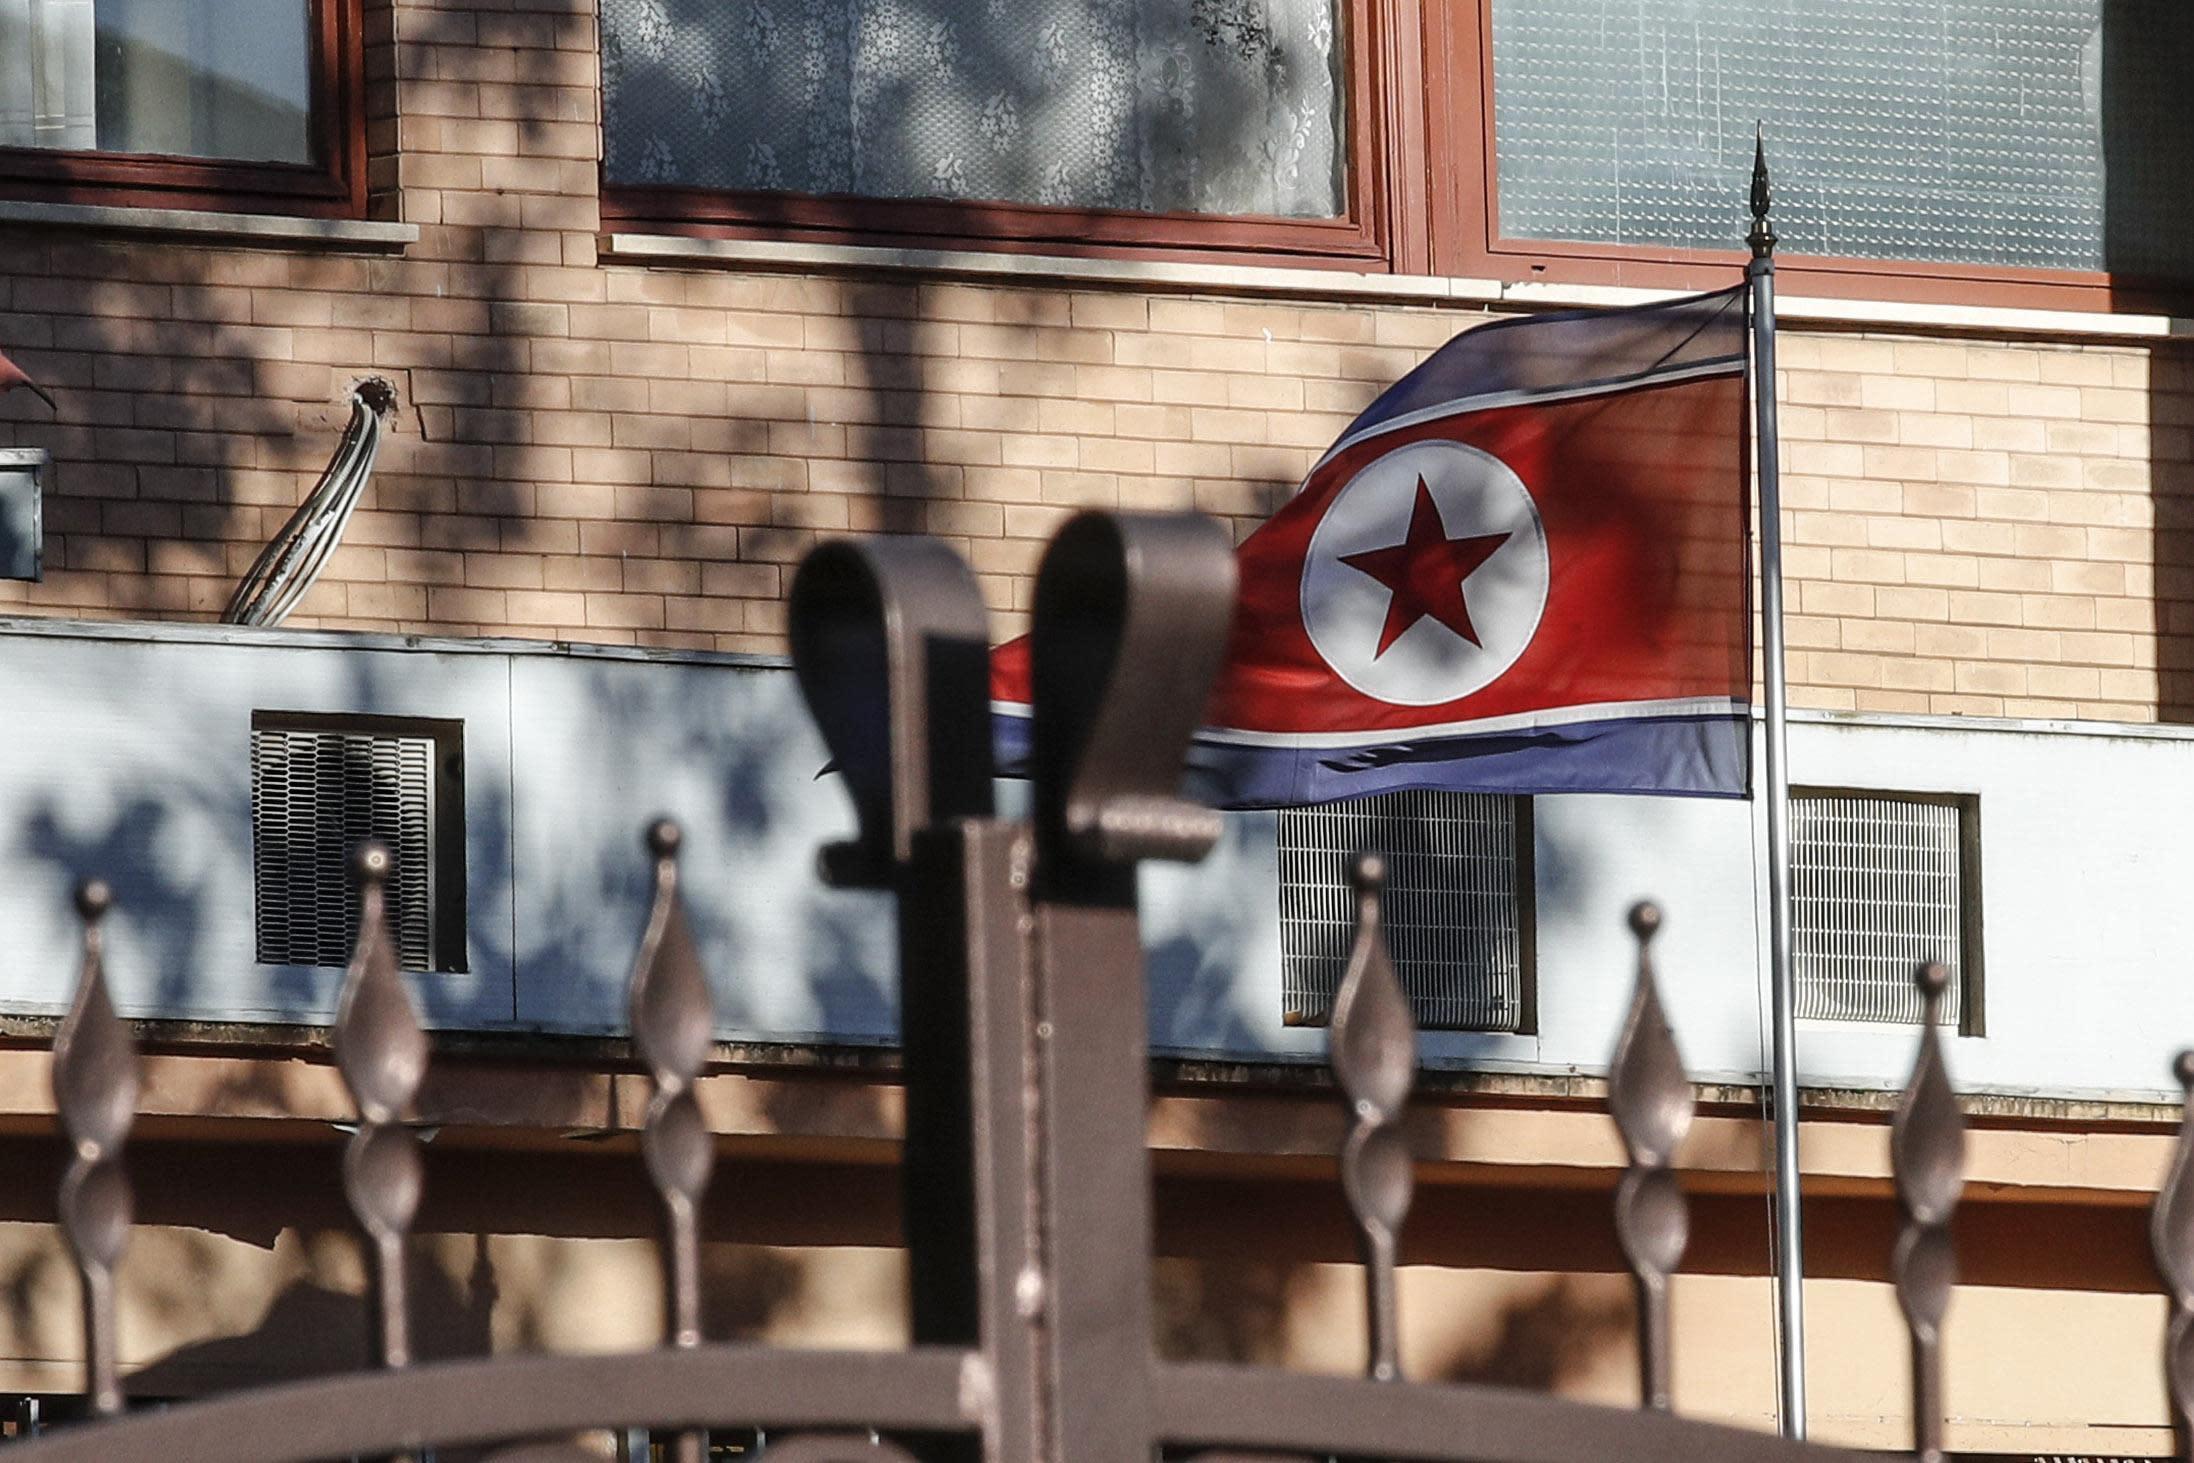 South Korea Koreas Diplomat in Hiding